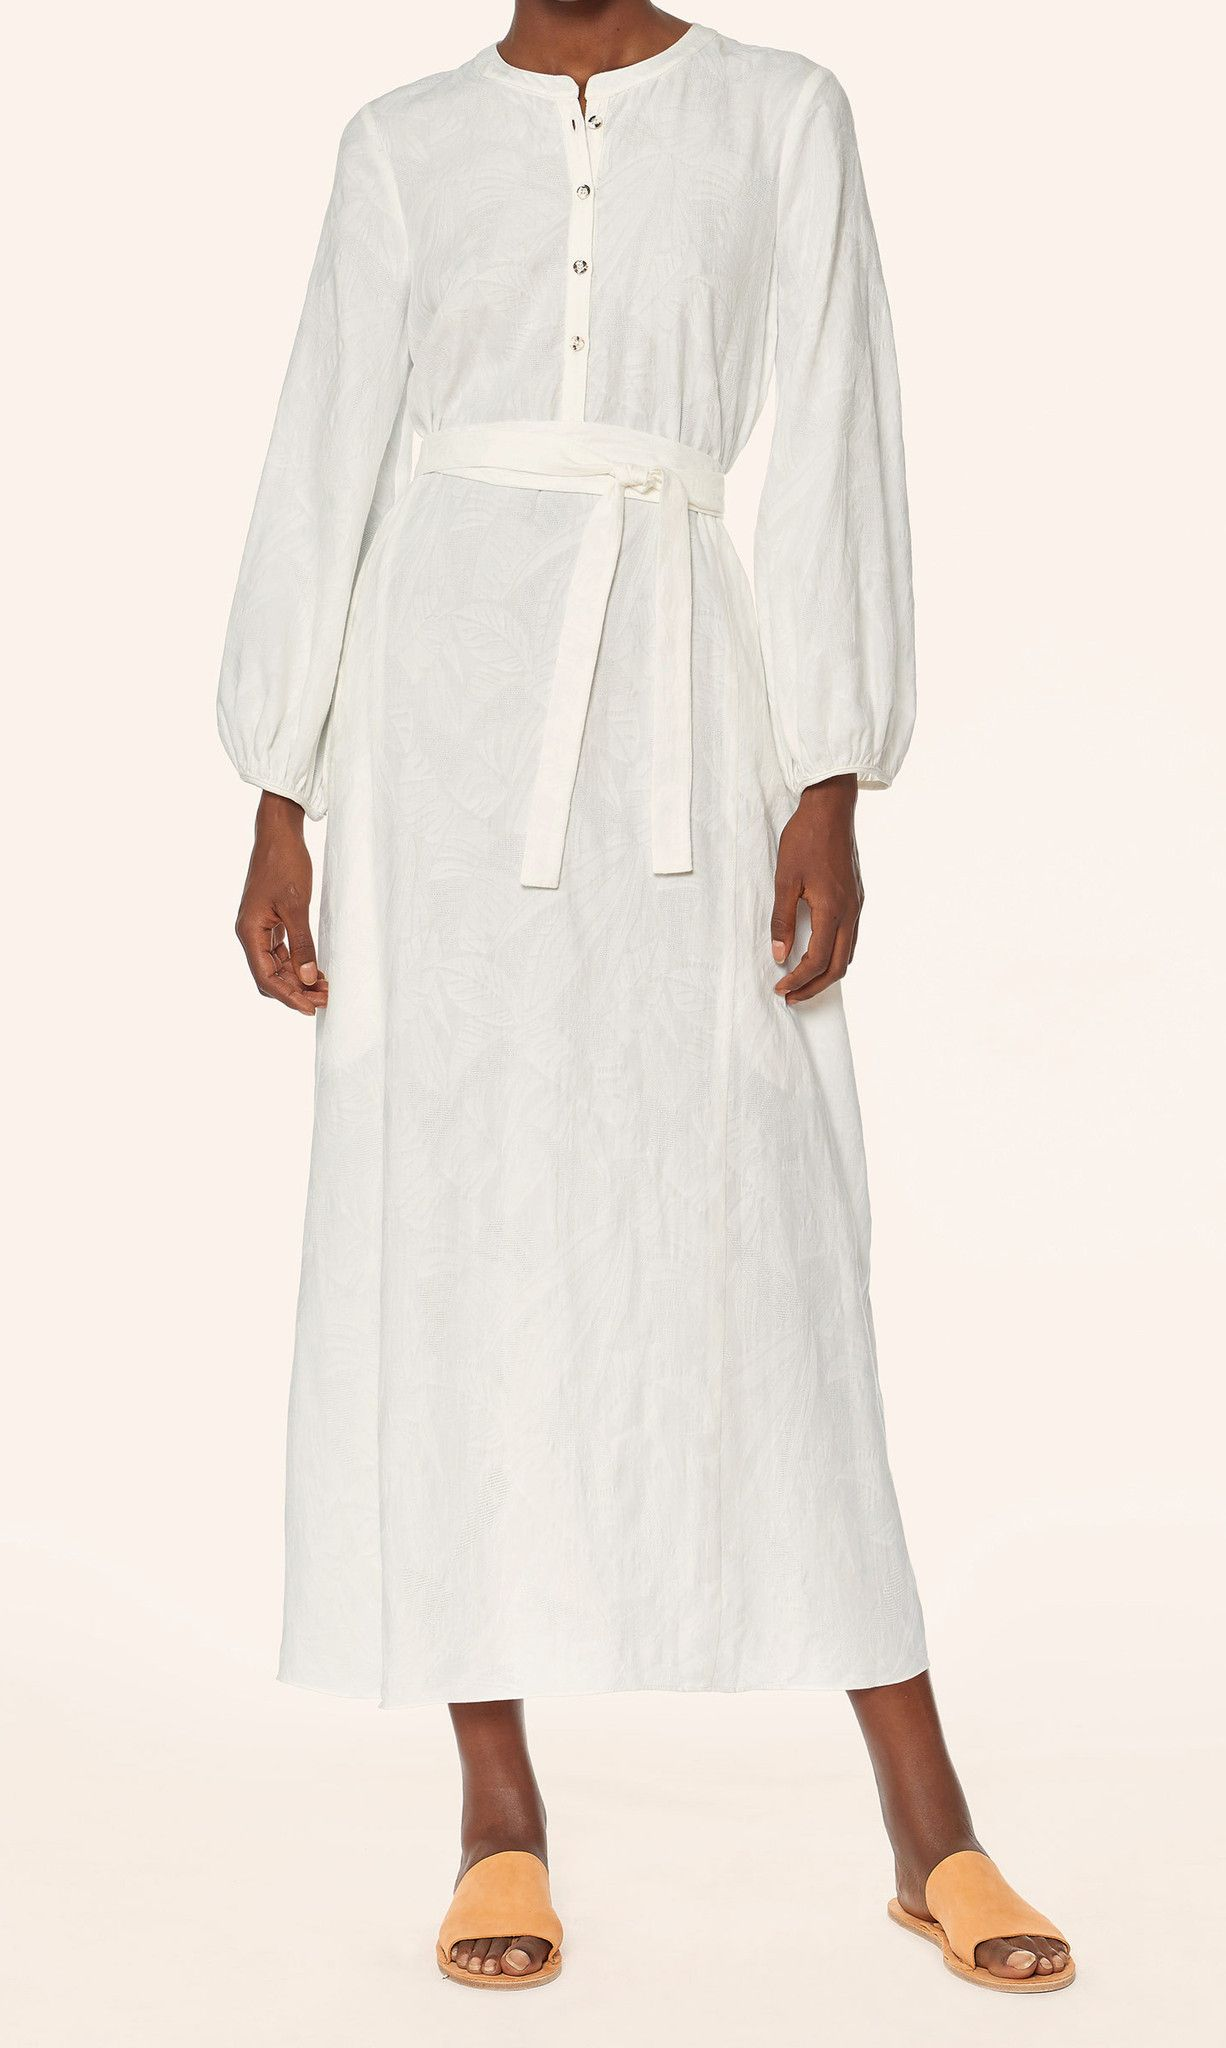 Mara Hoffman Maxi Peasant Dress in White